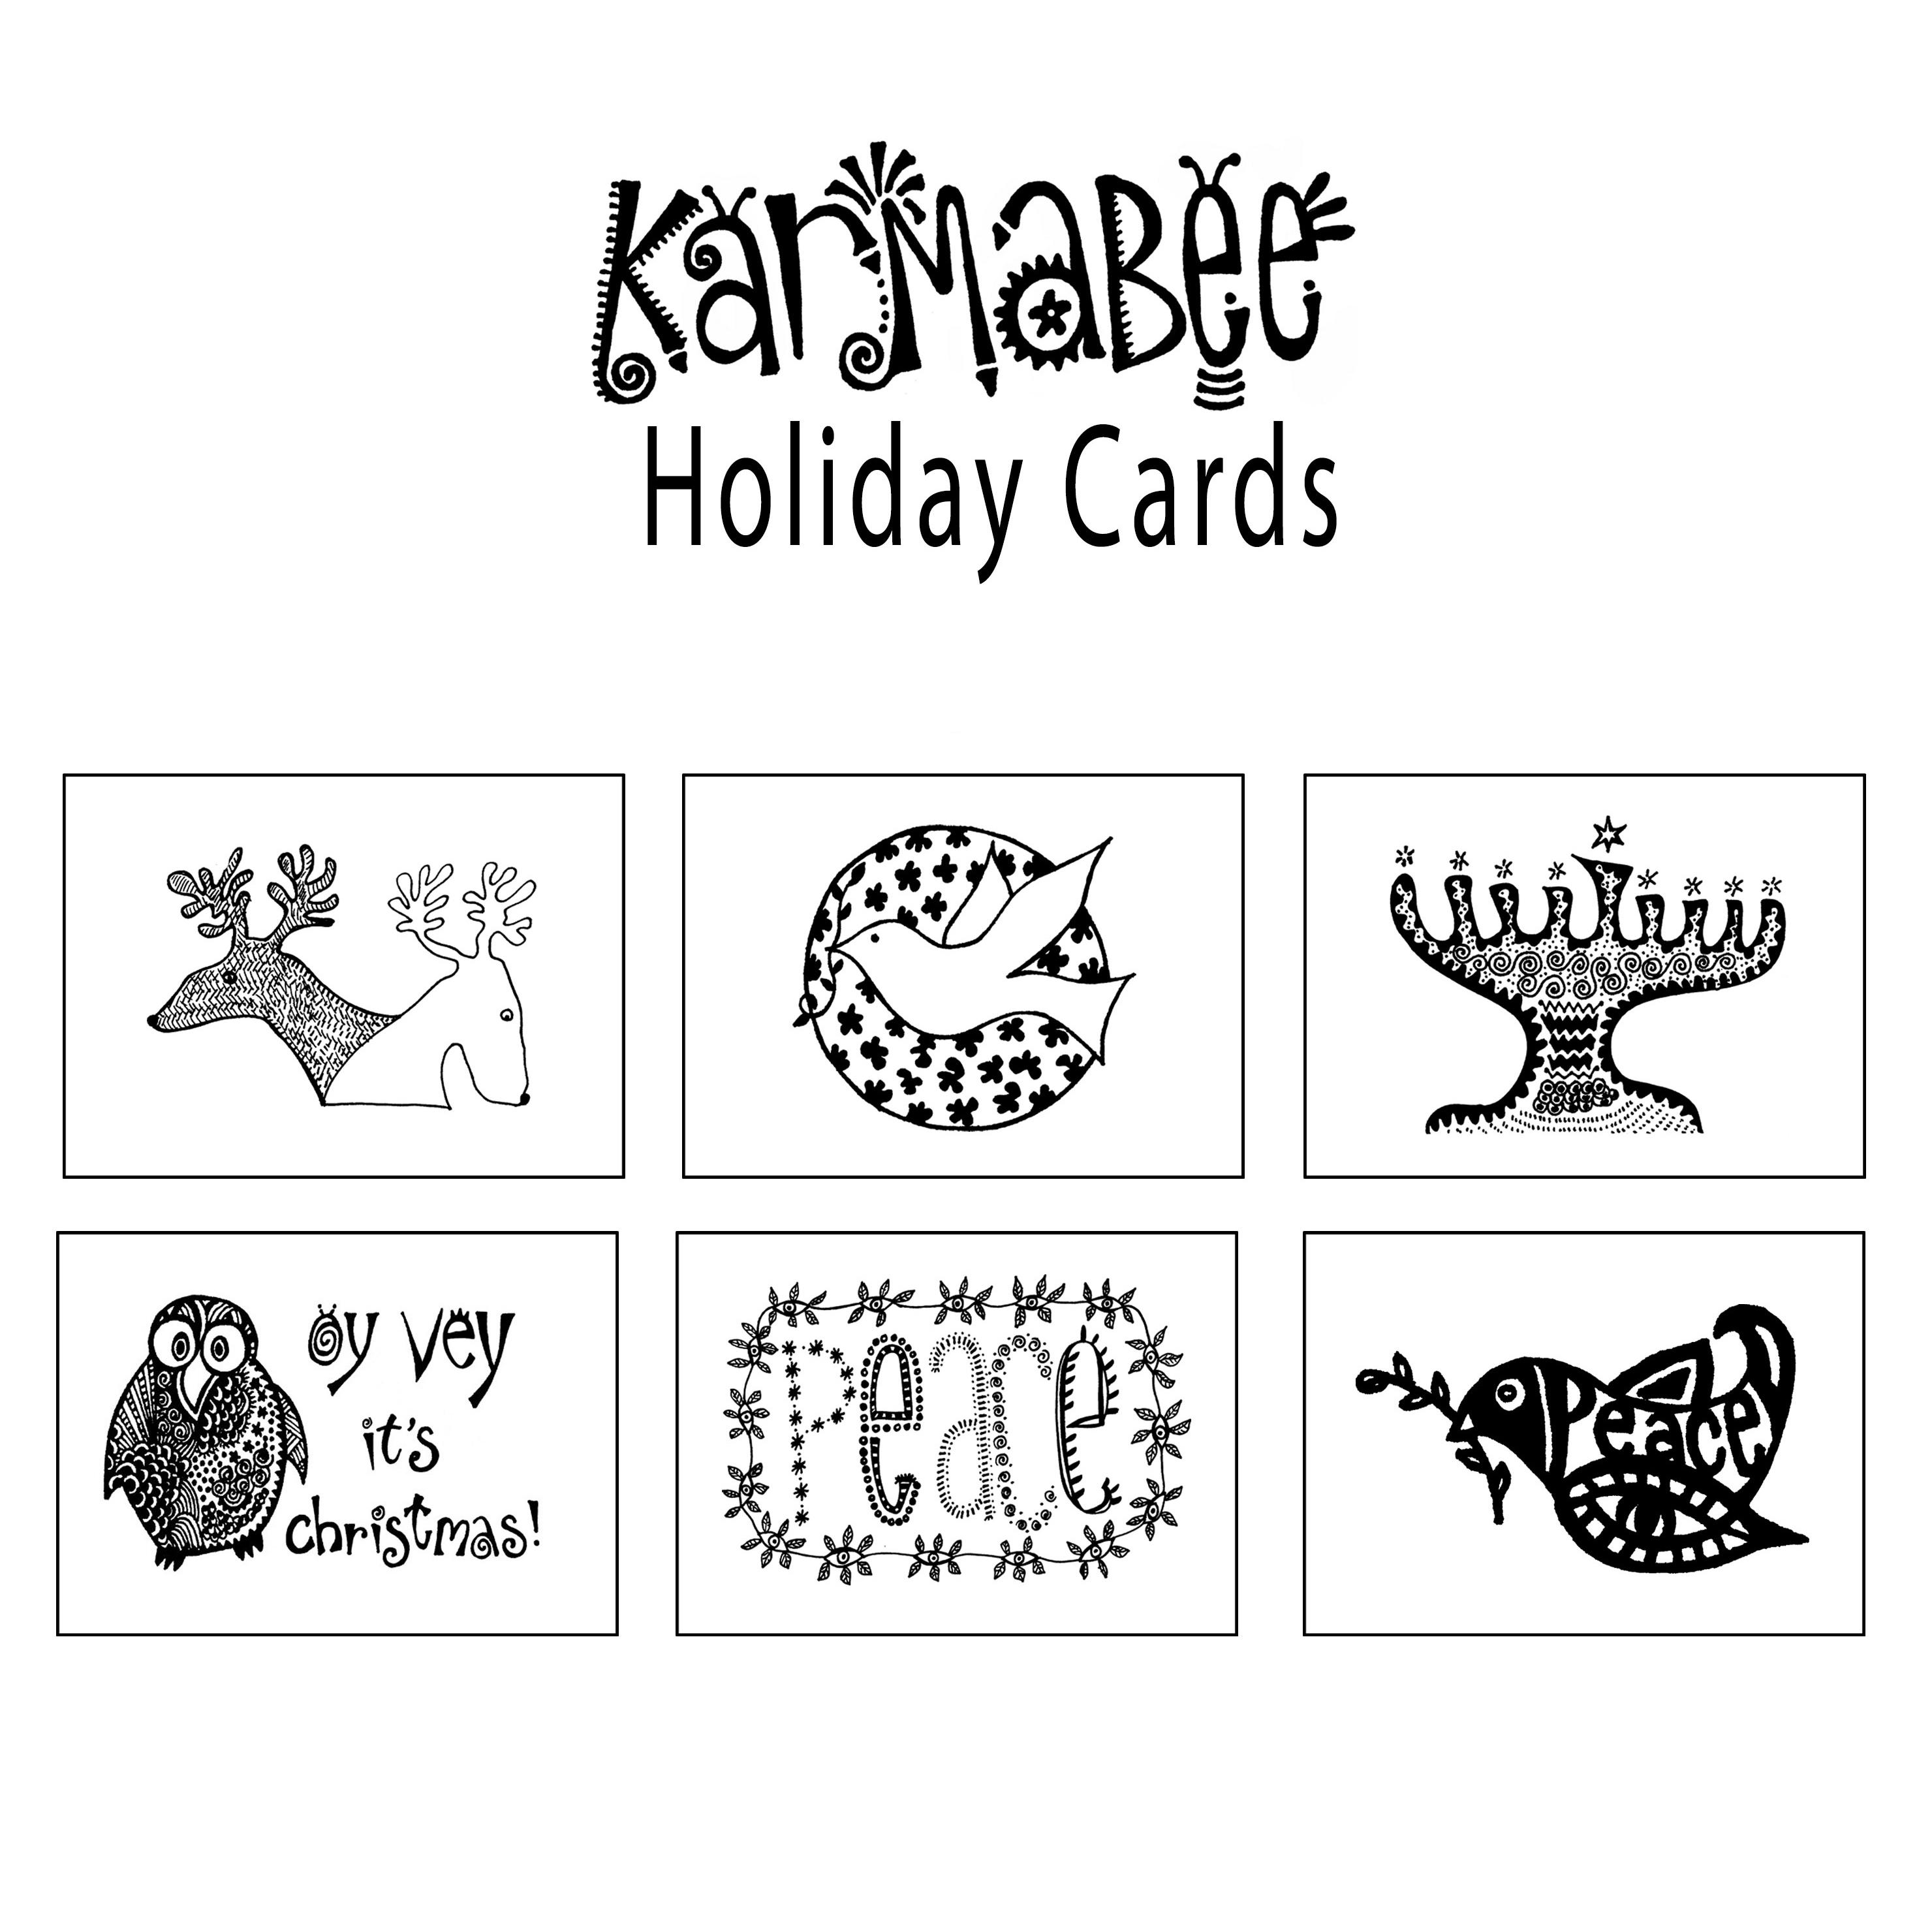 <Karmabee Holiday Cards image>